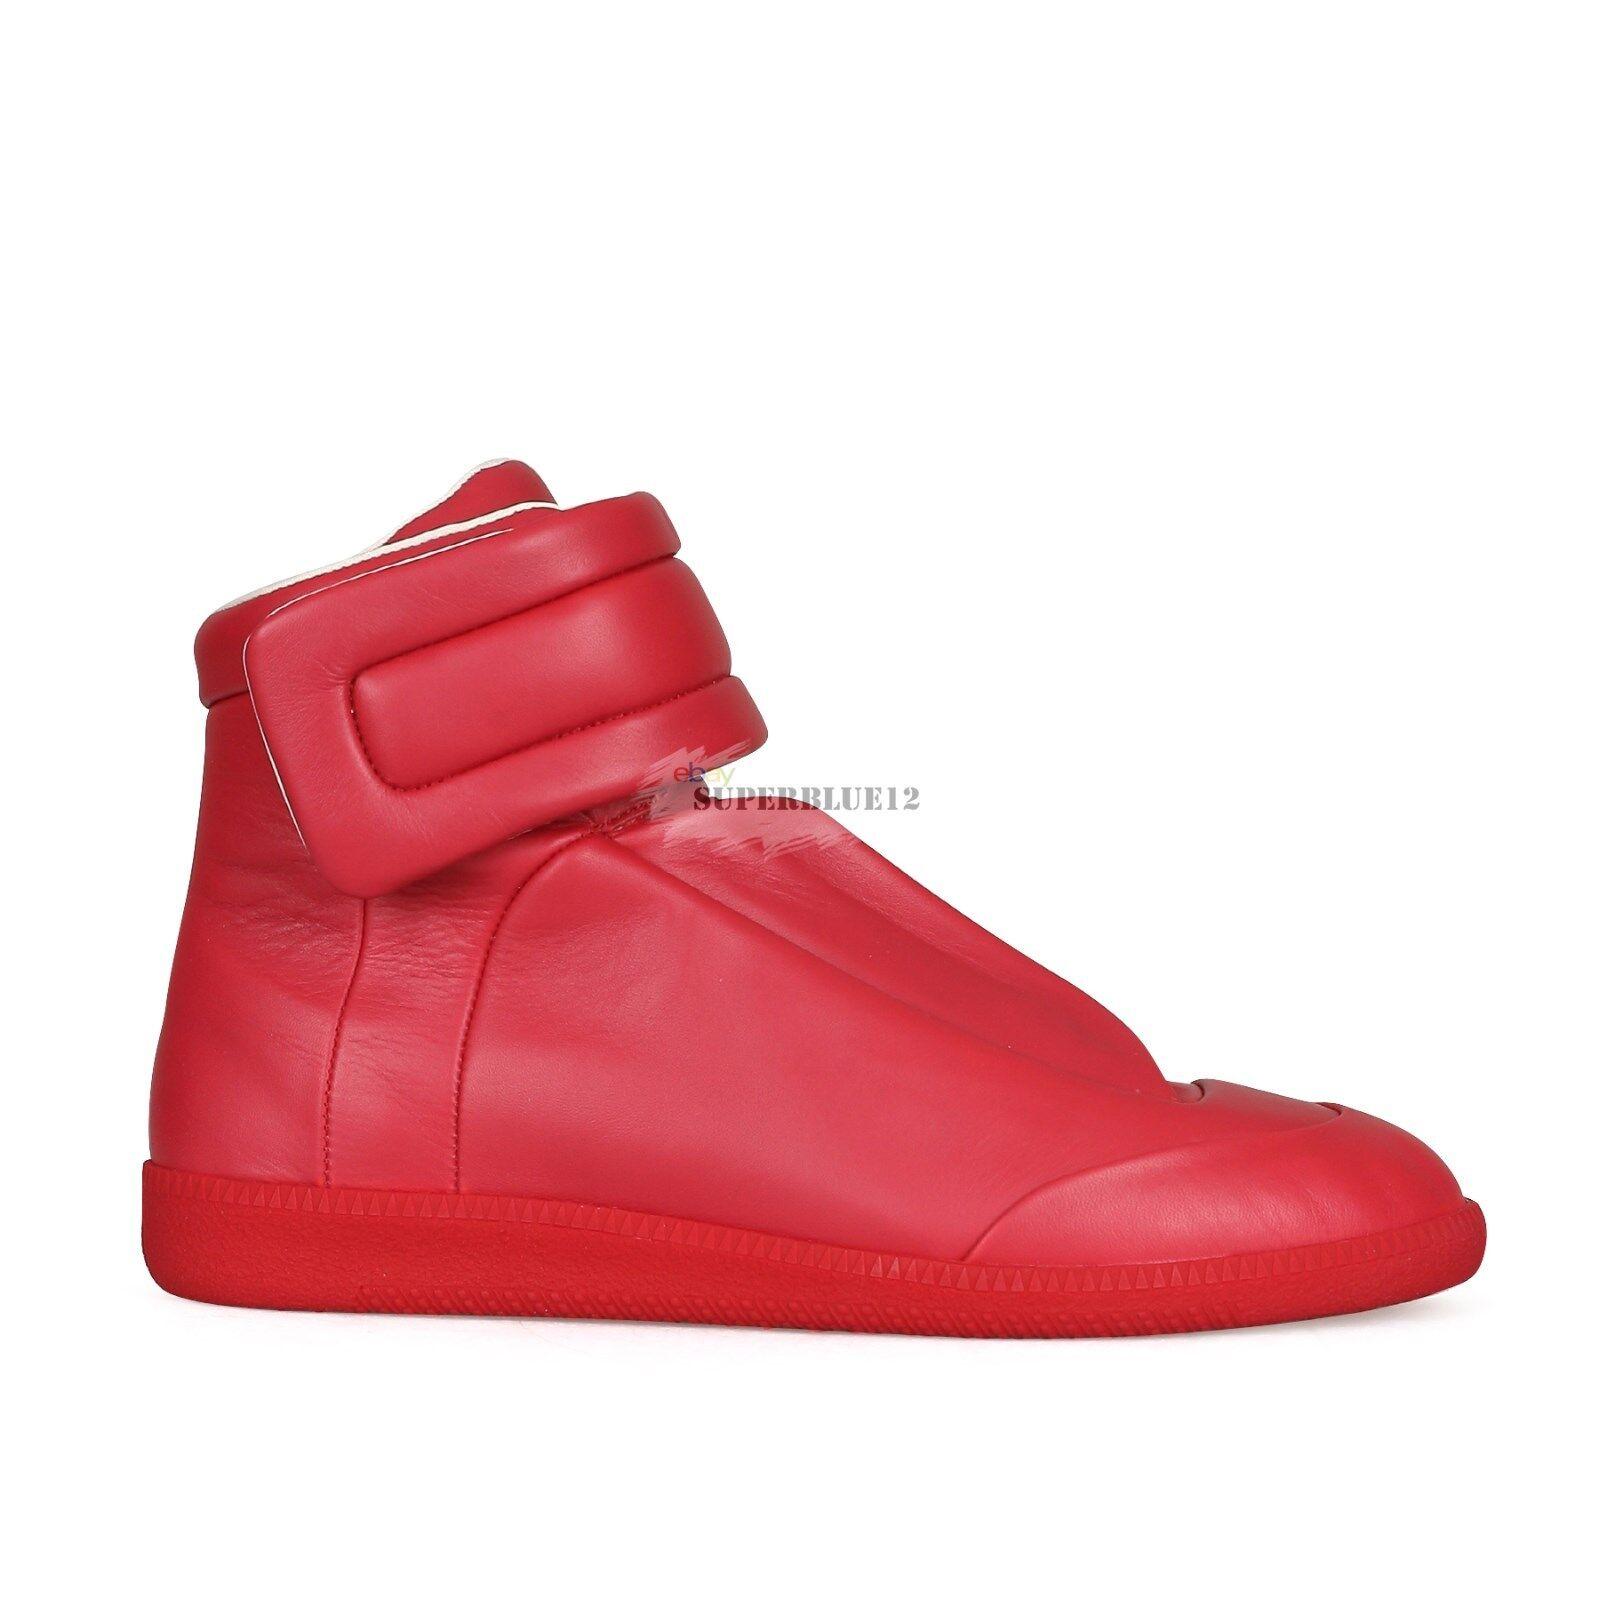 MAISON MARTIN MARGIELA FUTURE HIGH TOP SNEAKERS RED